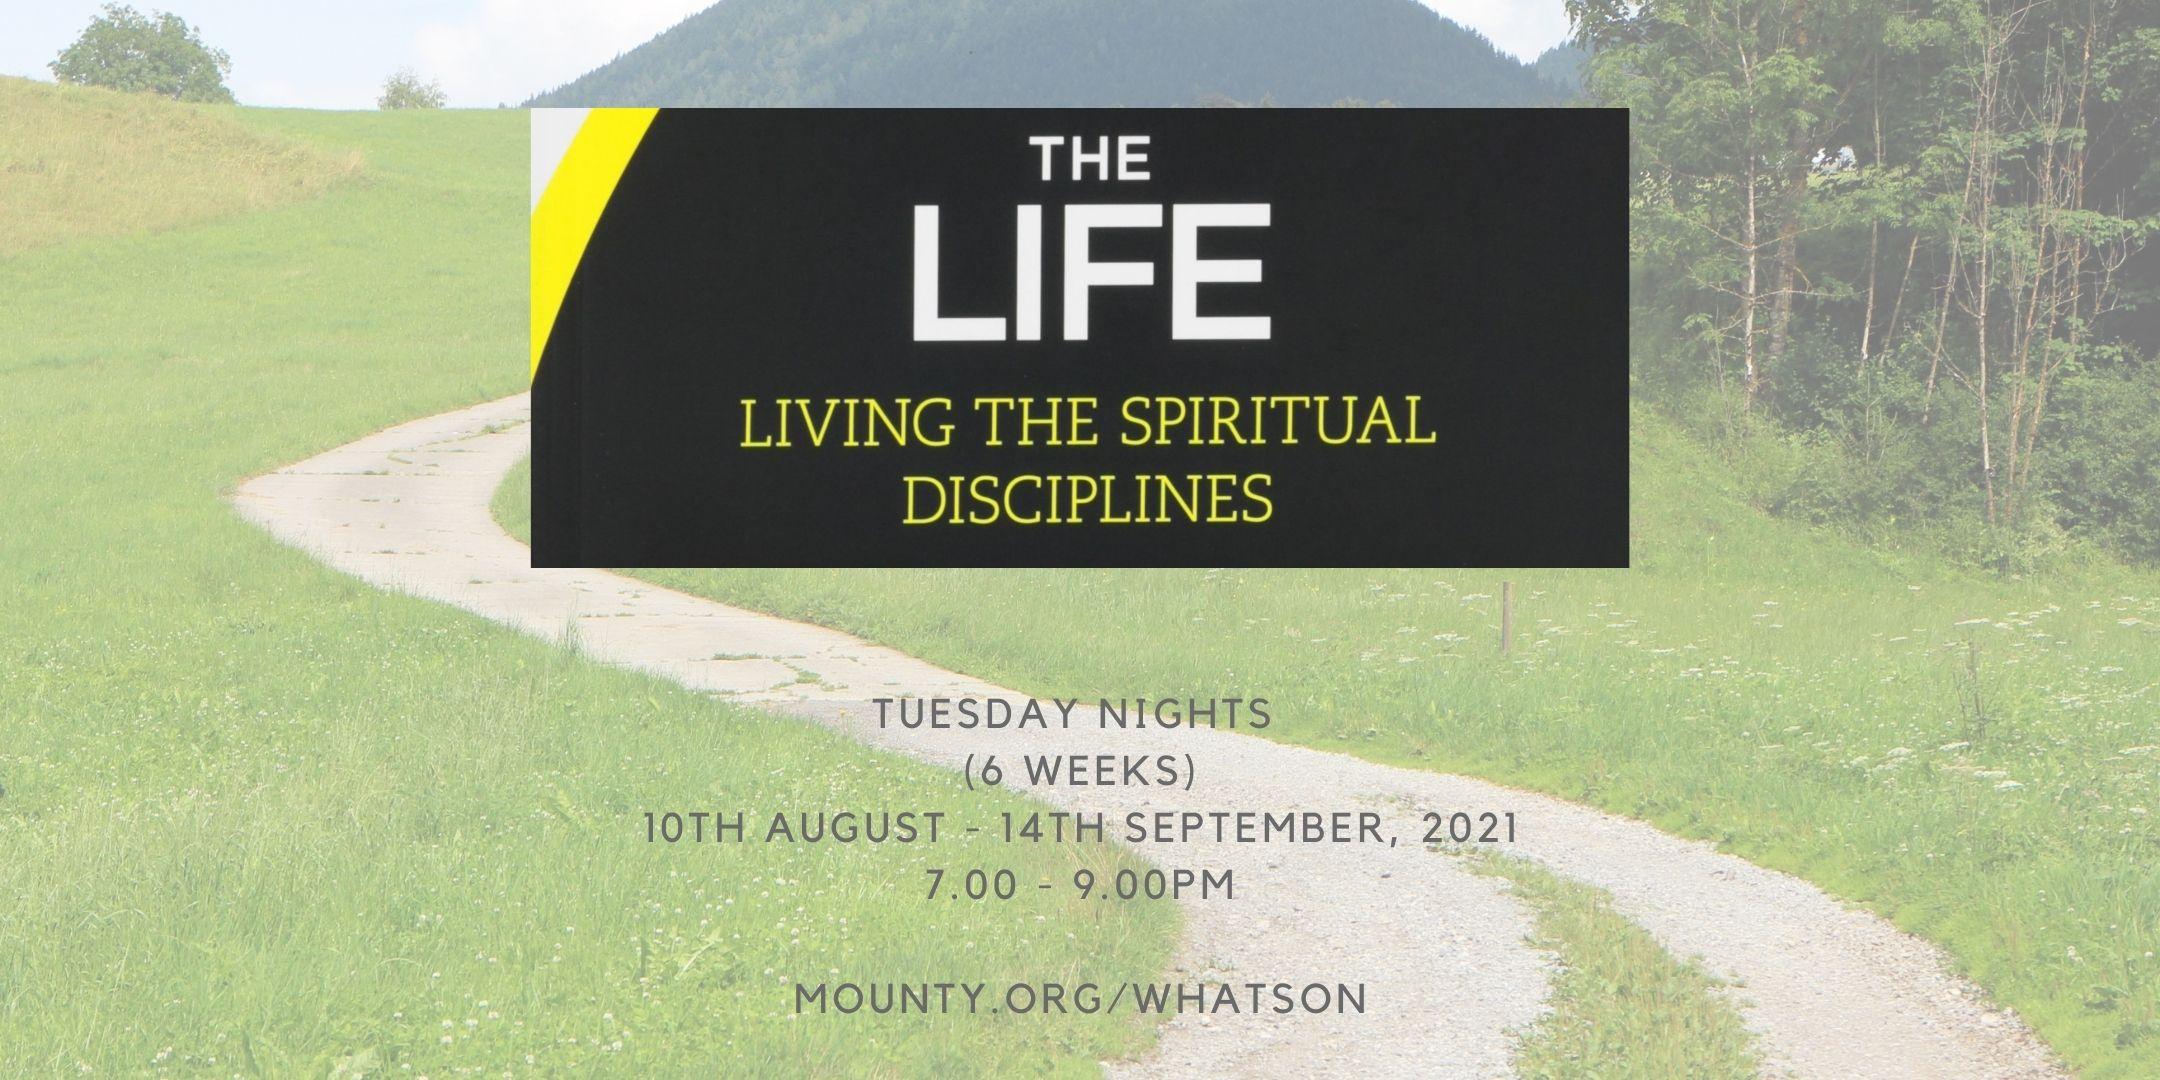 The Life – Living The Spiritual Disciplines